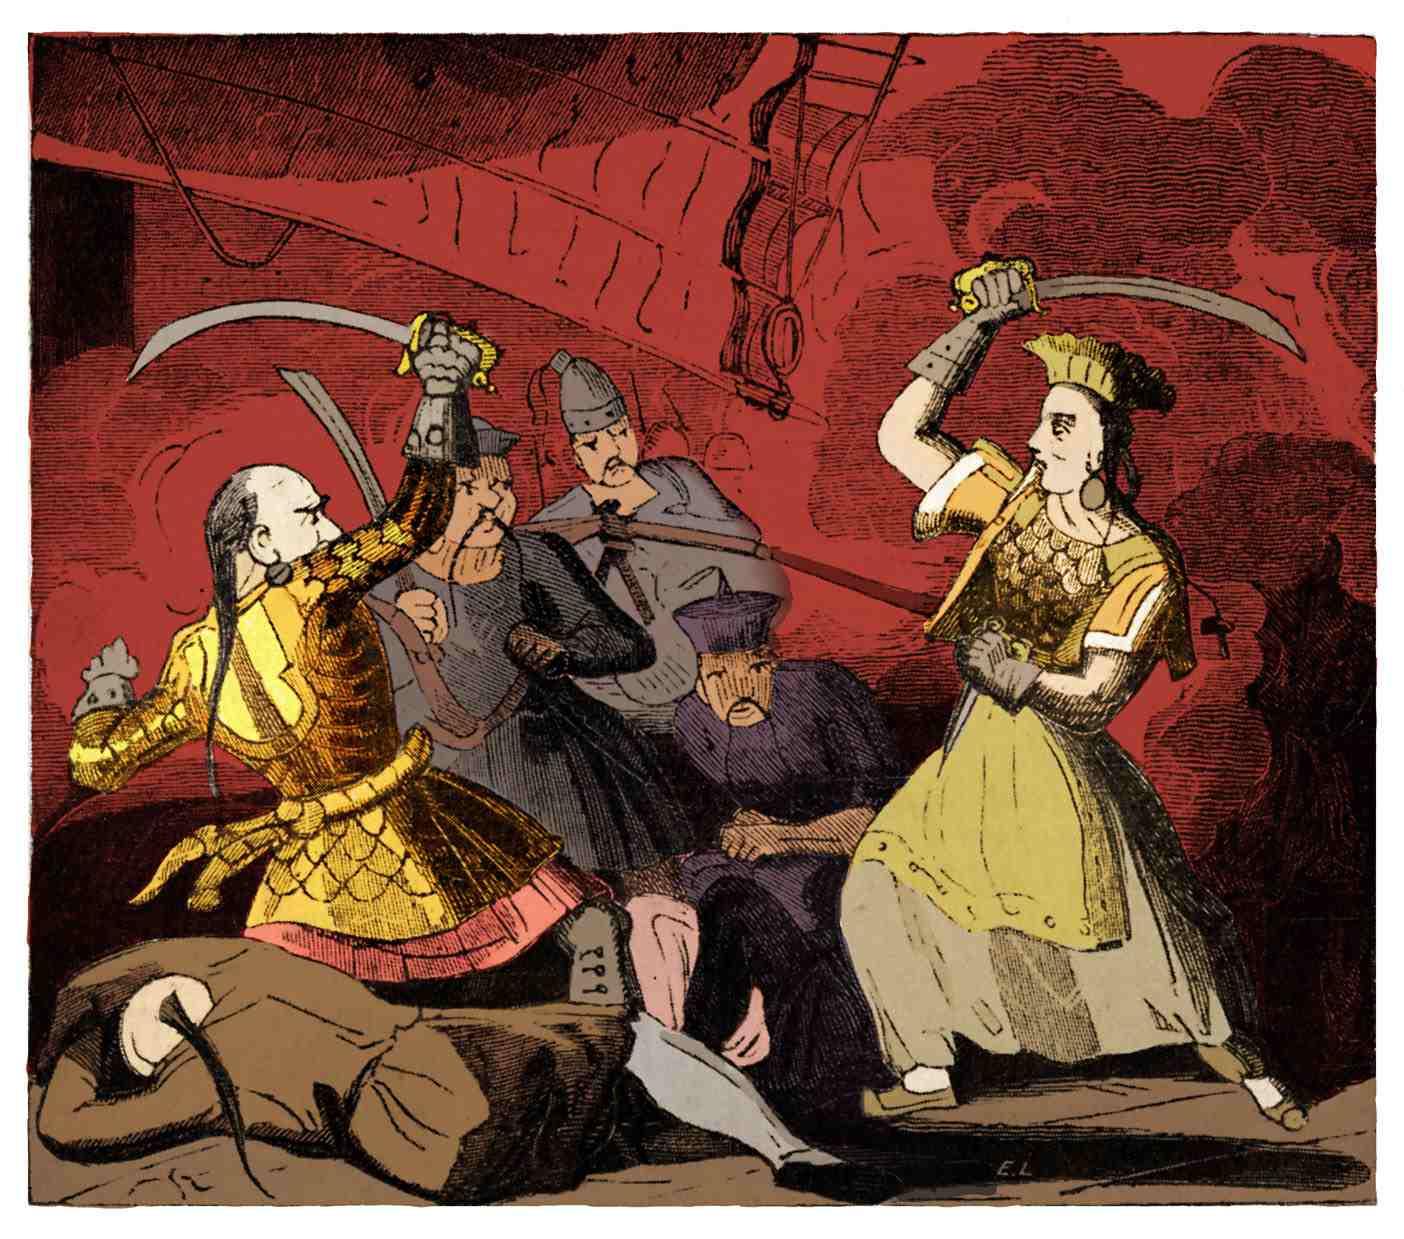 Mrs Ching widow of pirate Adminiral Ching